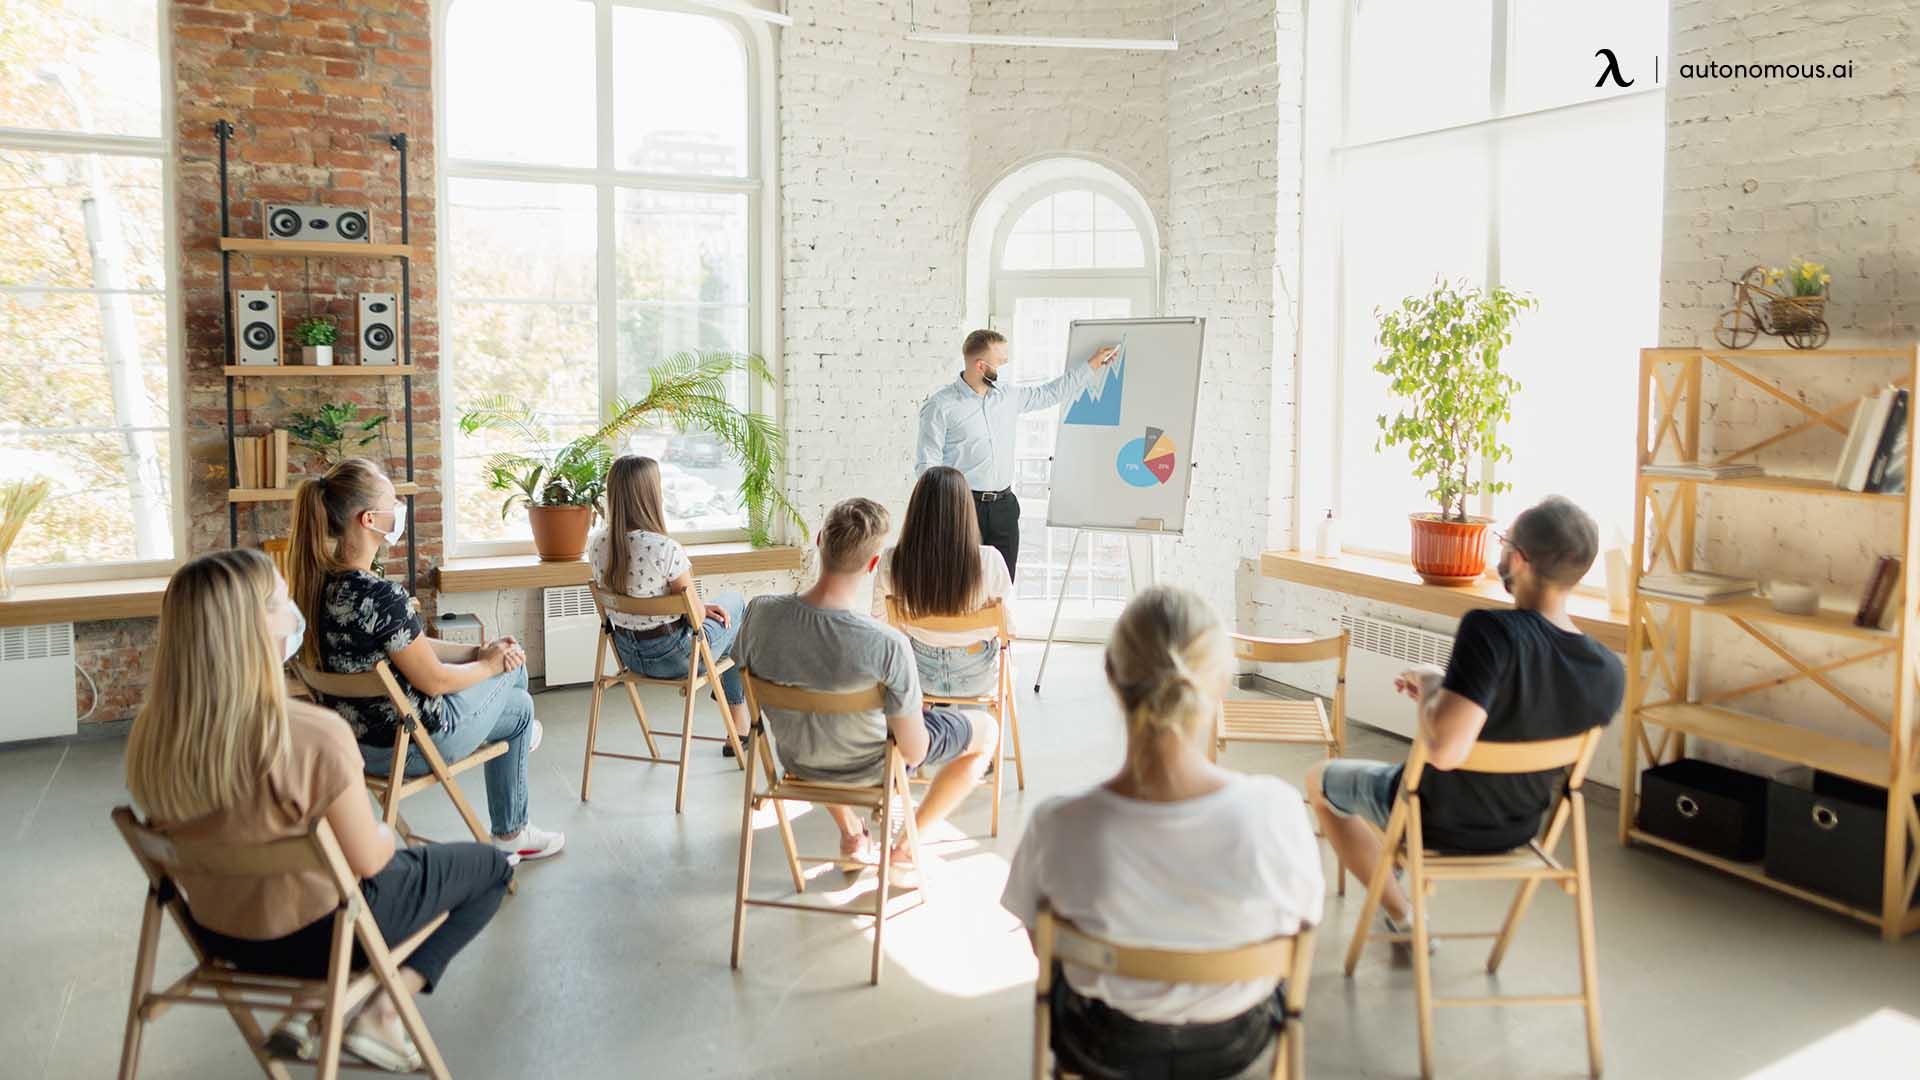 Providing More Workshops or Resources